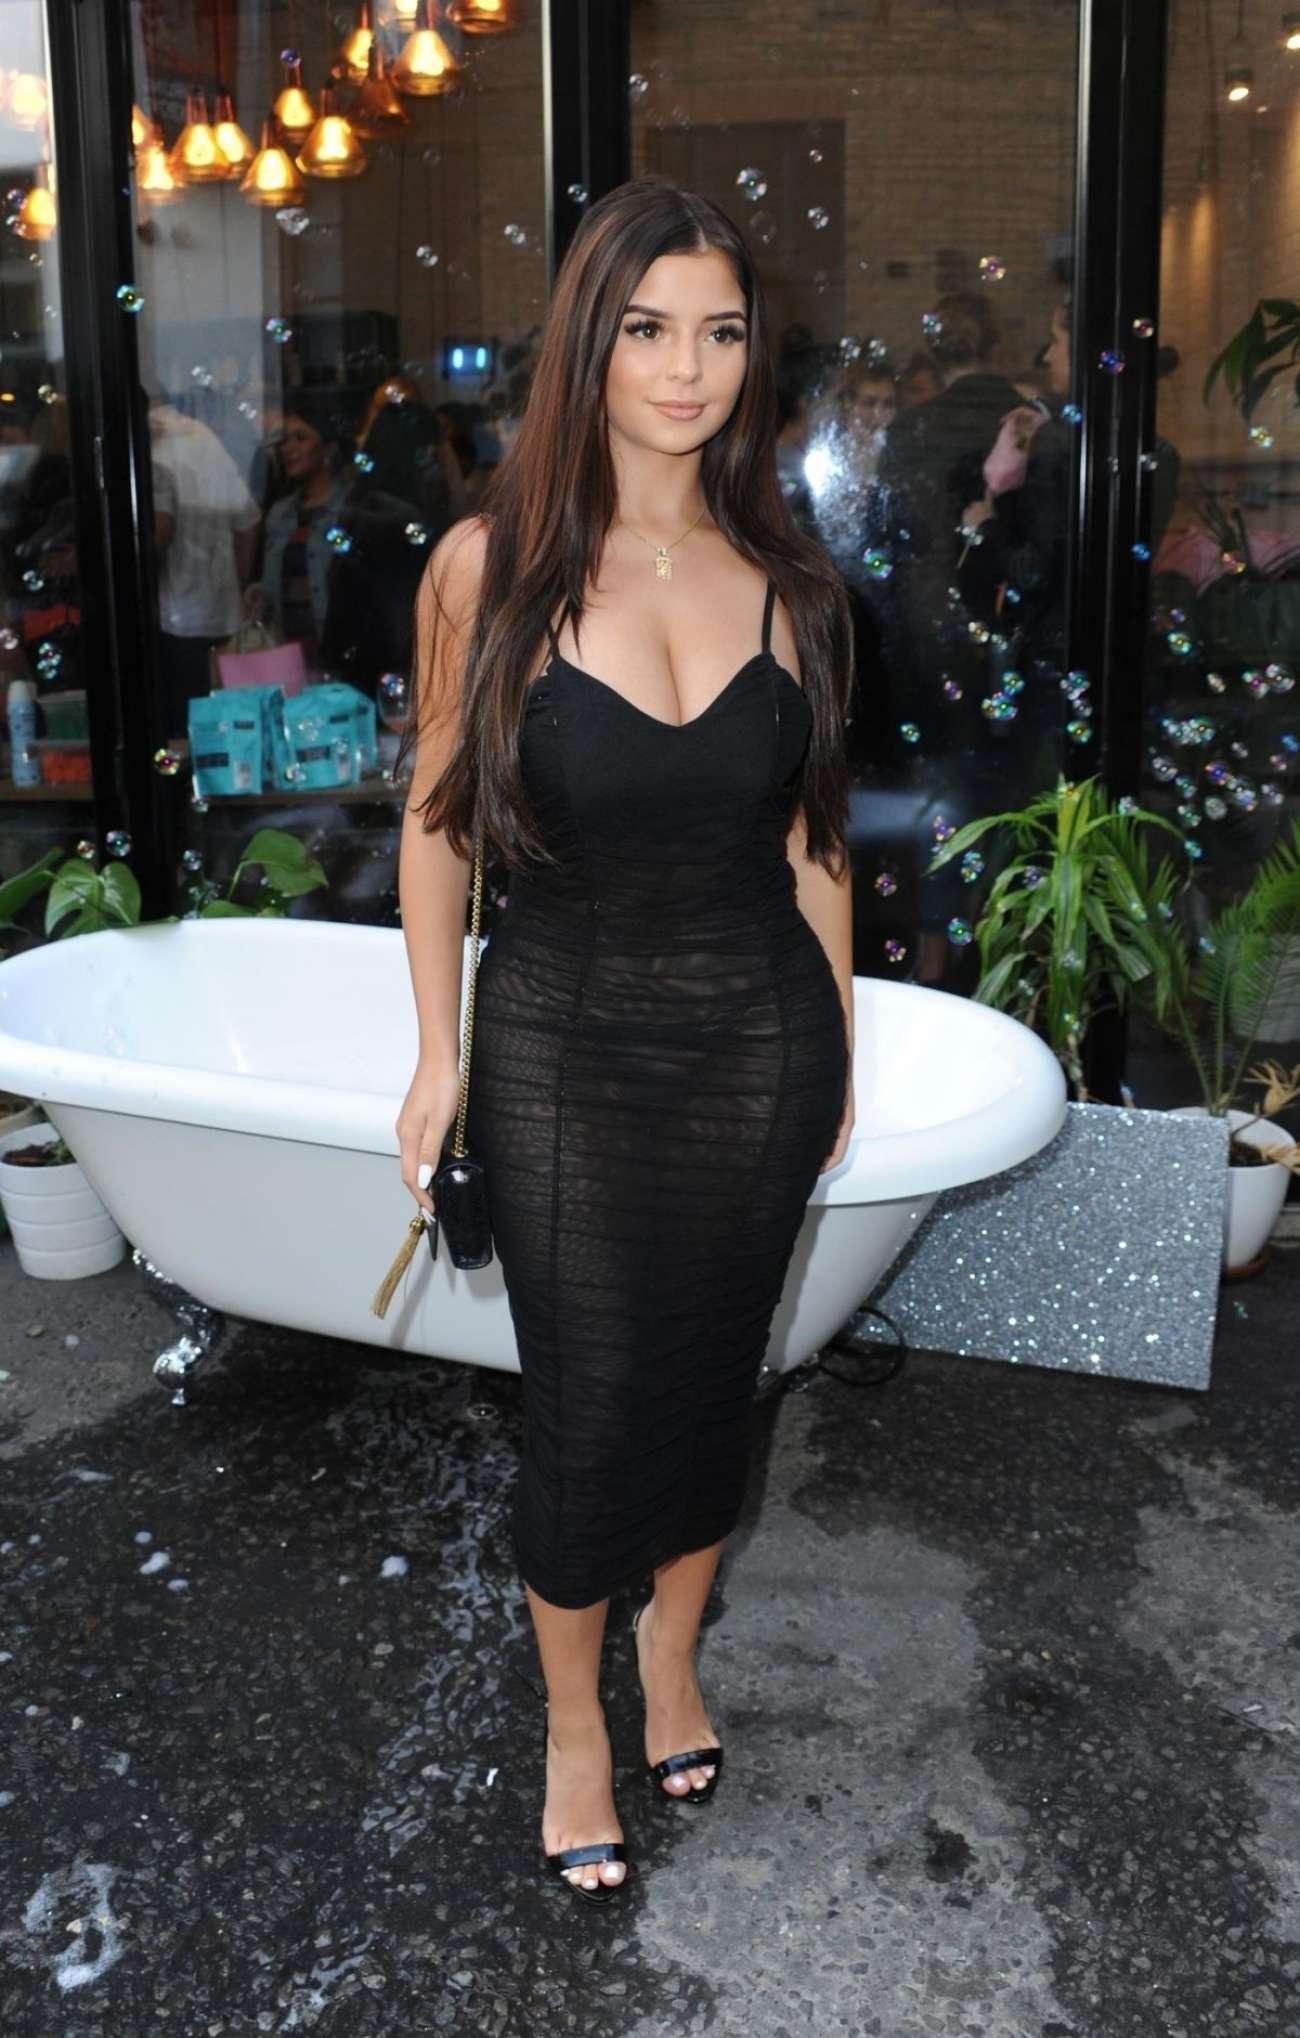 Demi Rose Mawby 2018 : Demi Rose Mawby: Skinny Dip Event In London-21